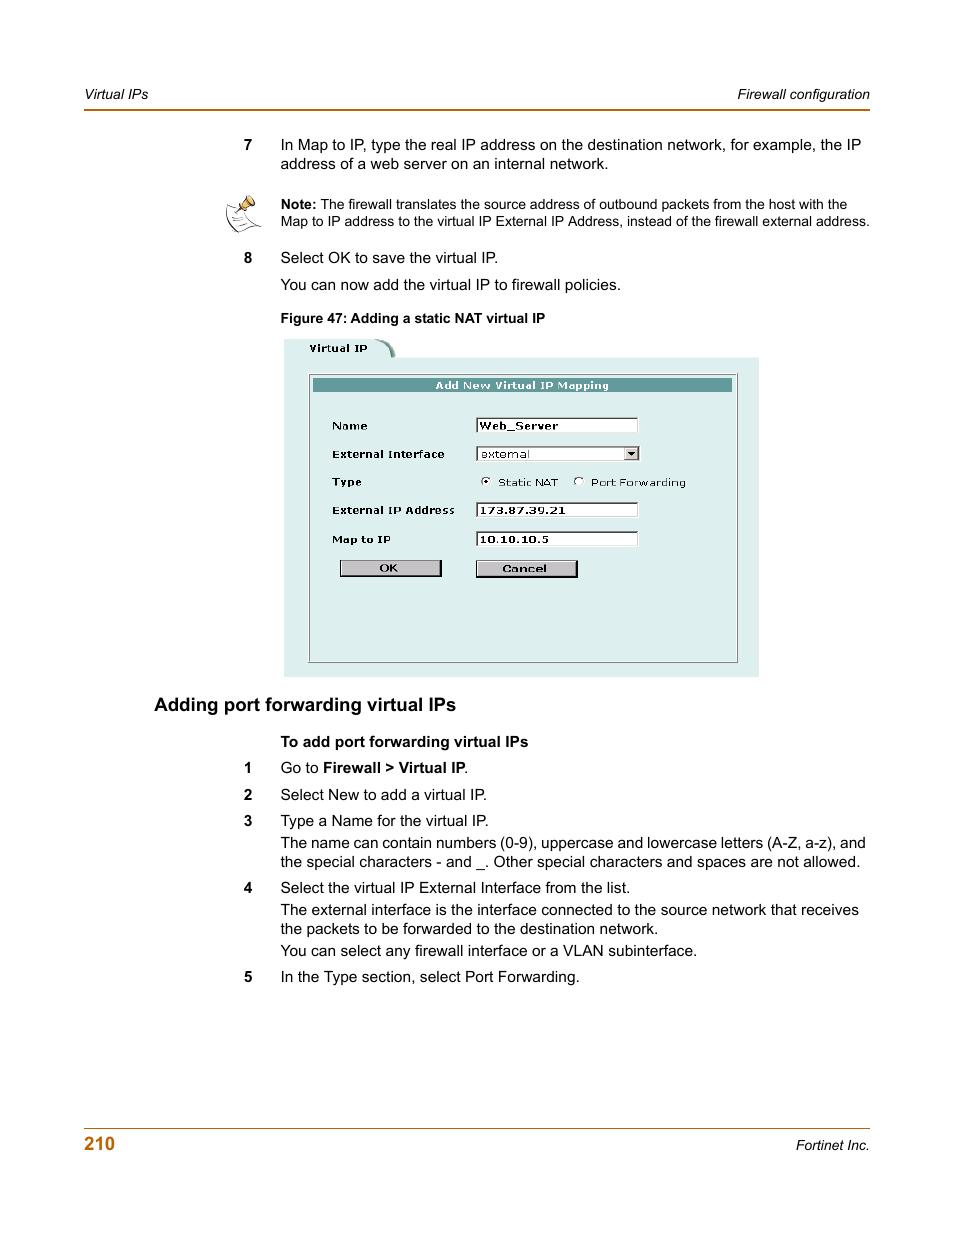 Adding port forwarding virtual ips, Ding port forwarding